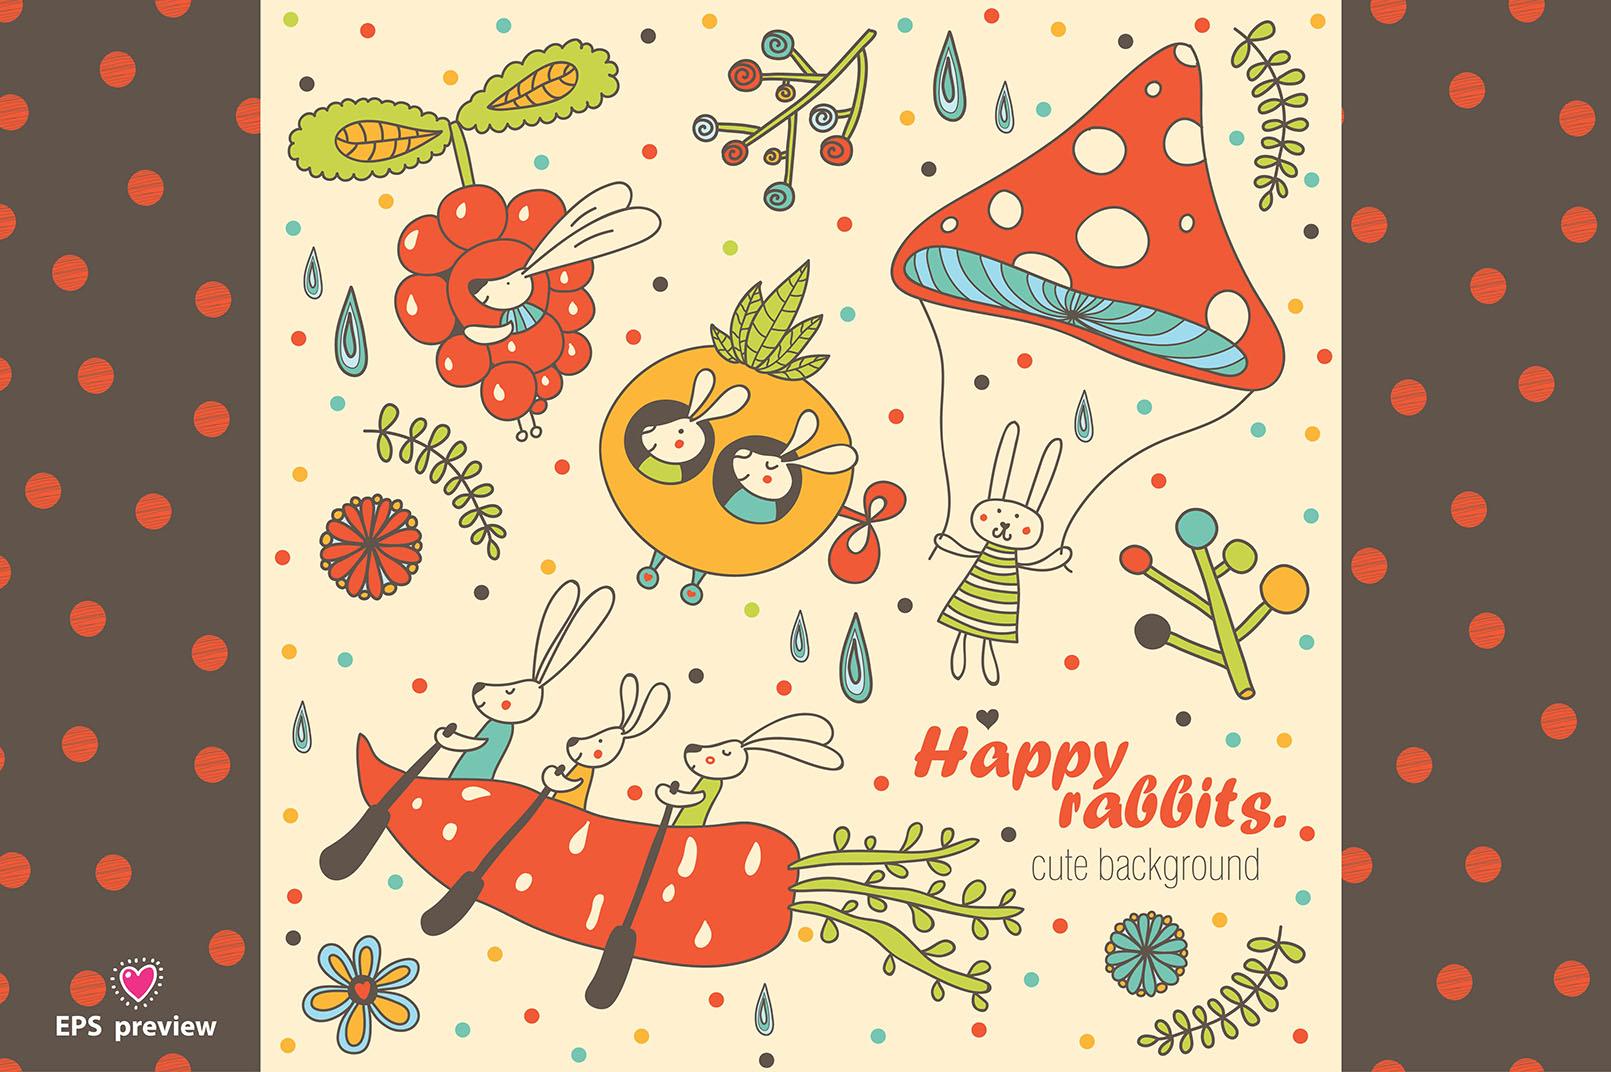 Happy rabbits! example image 6